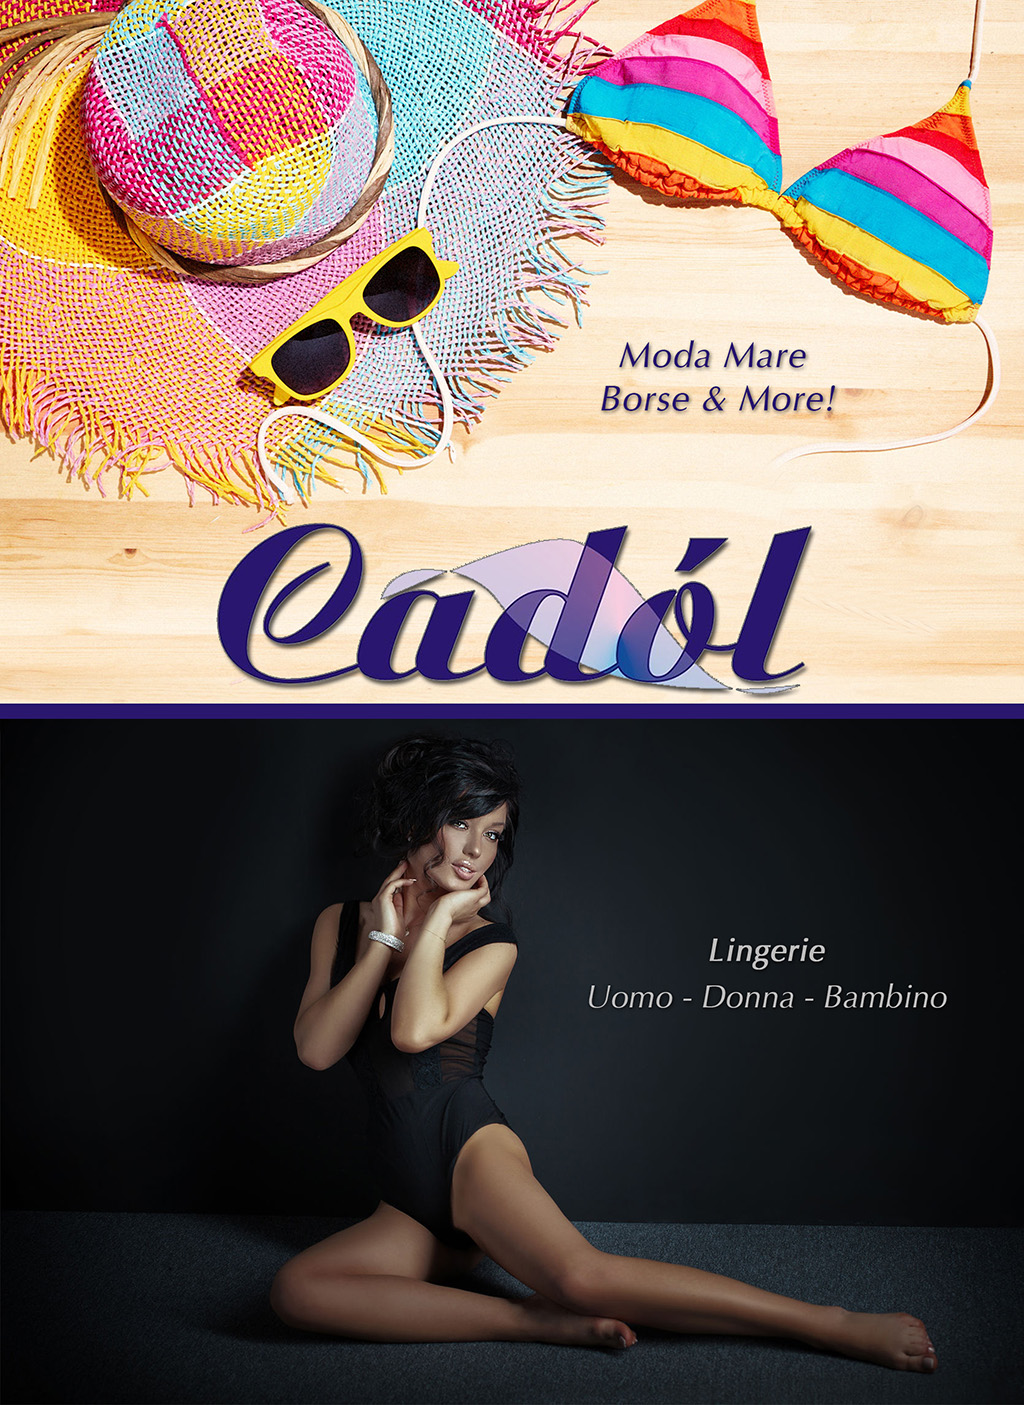 locandina_cadol